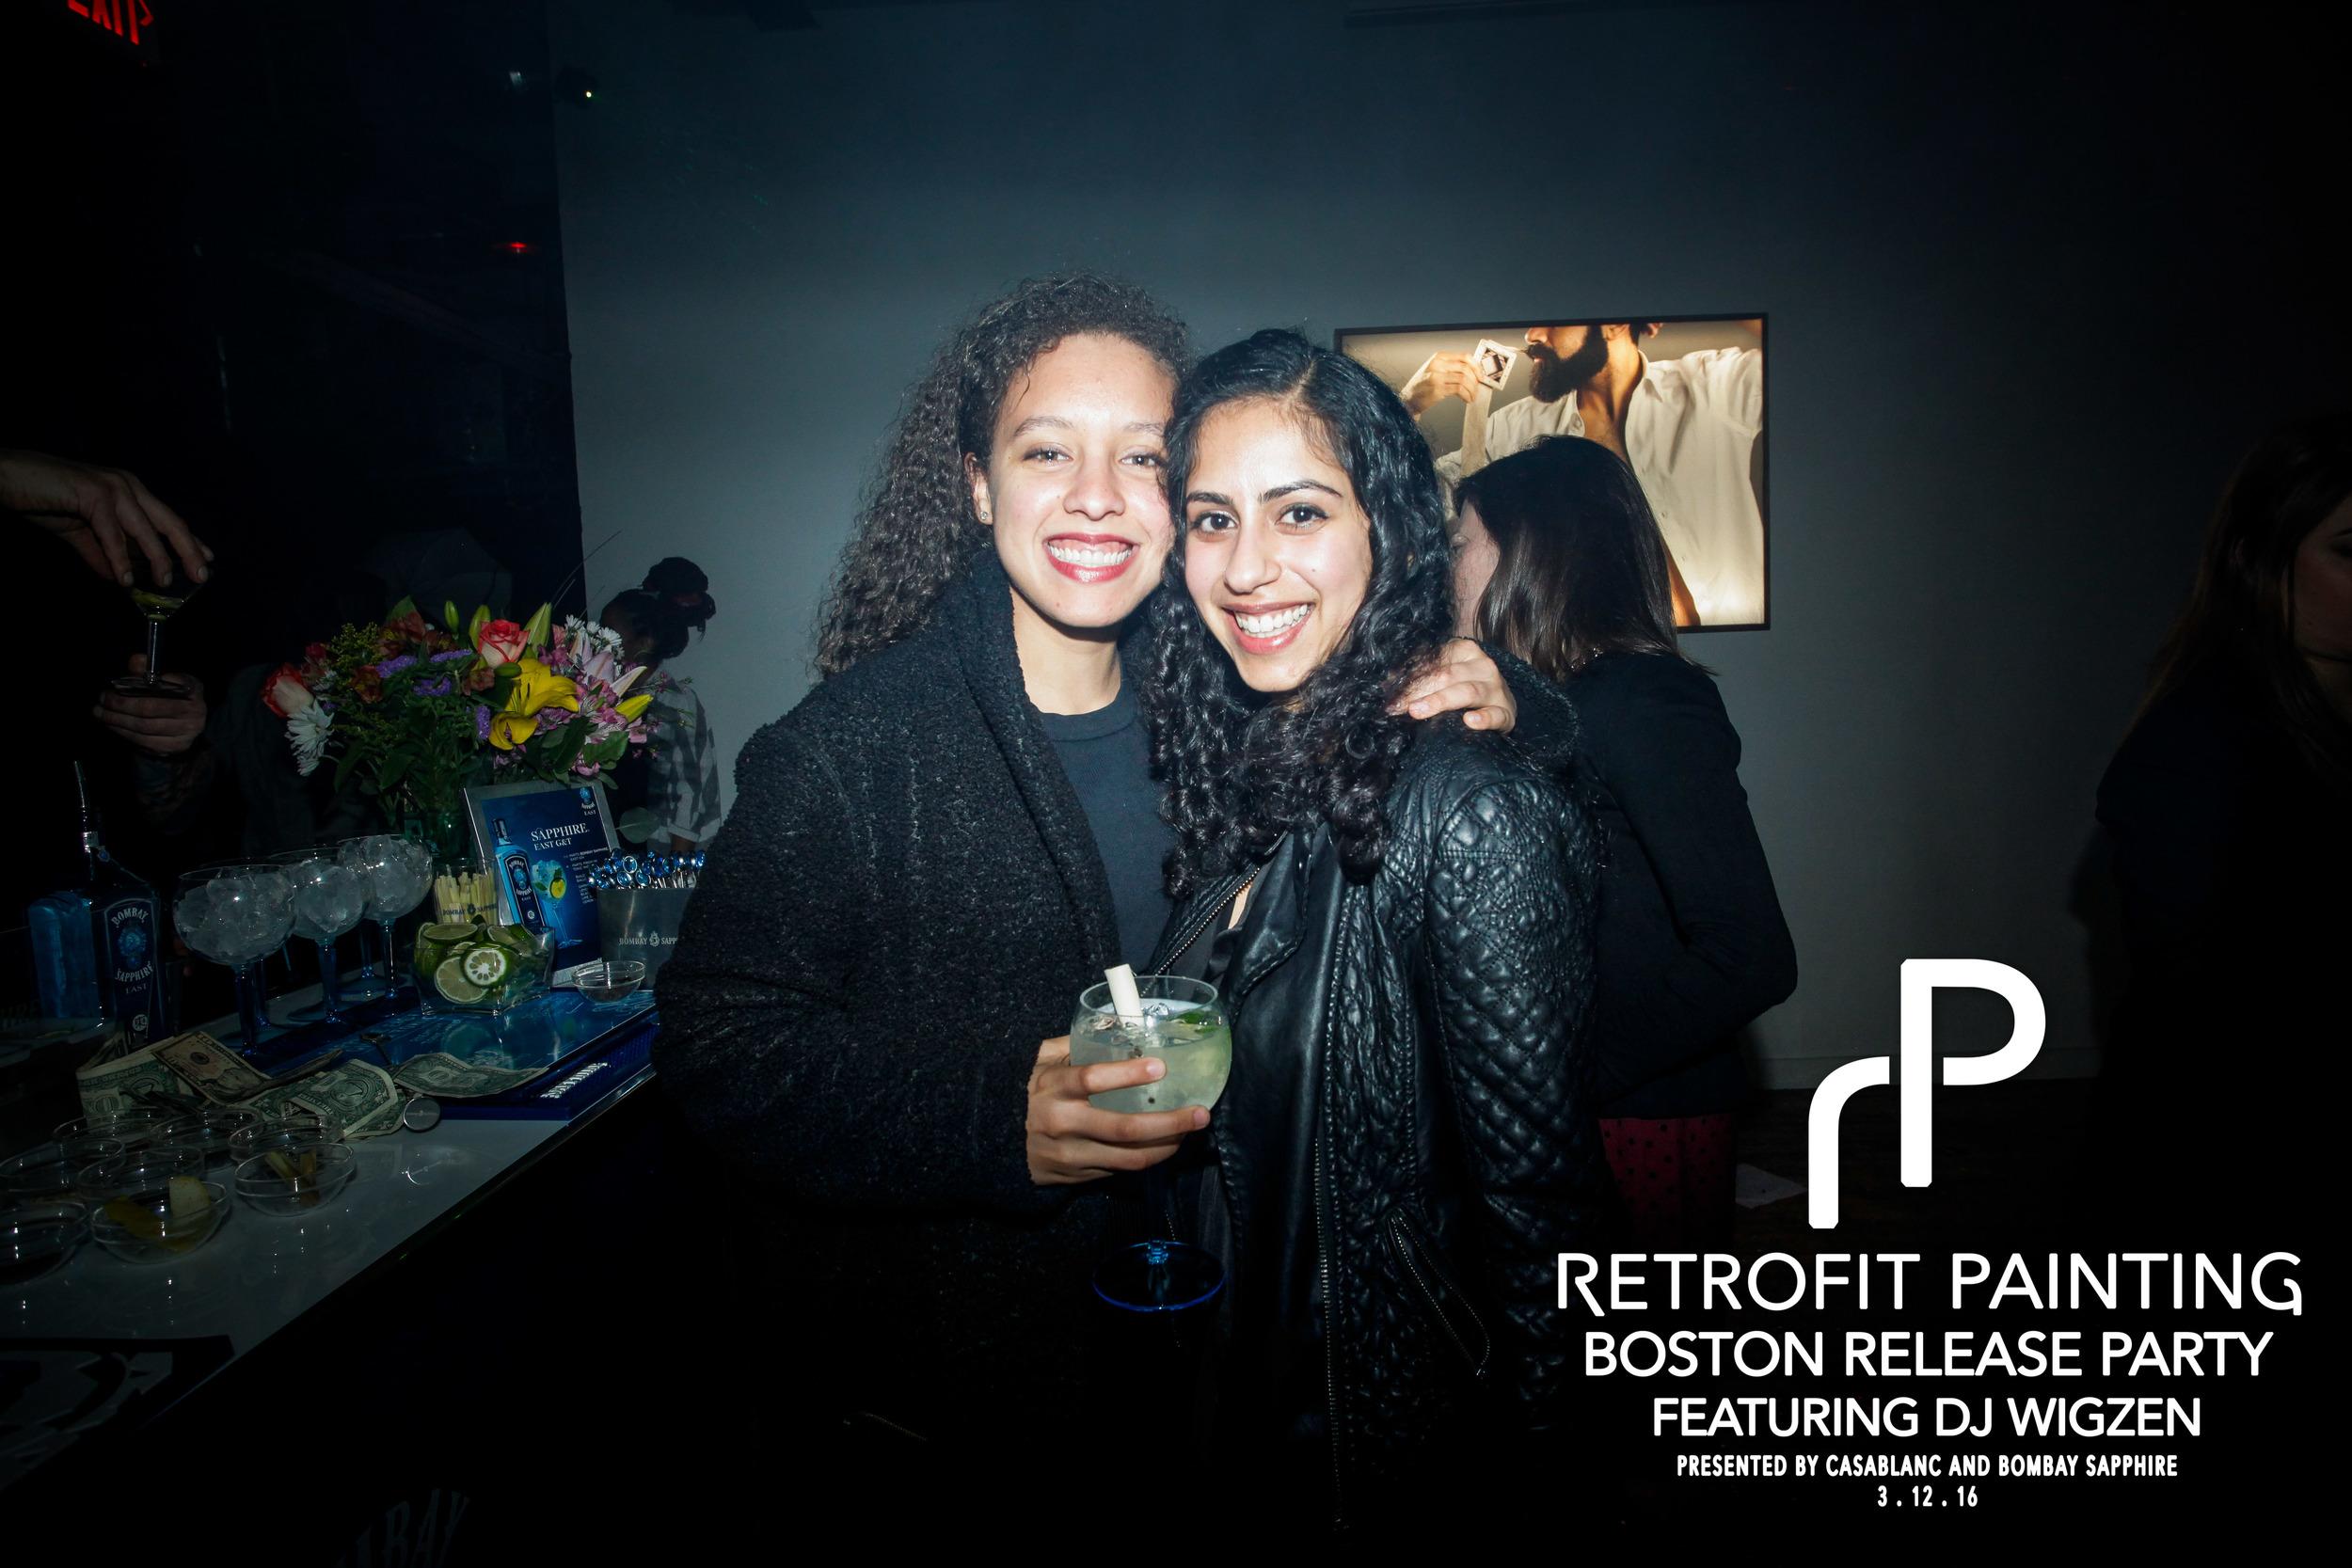 Retrofit Painting Boston Release Party 0125.jpg